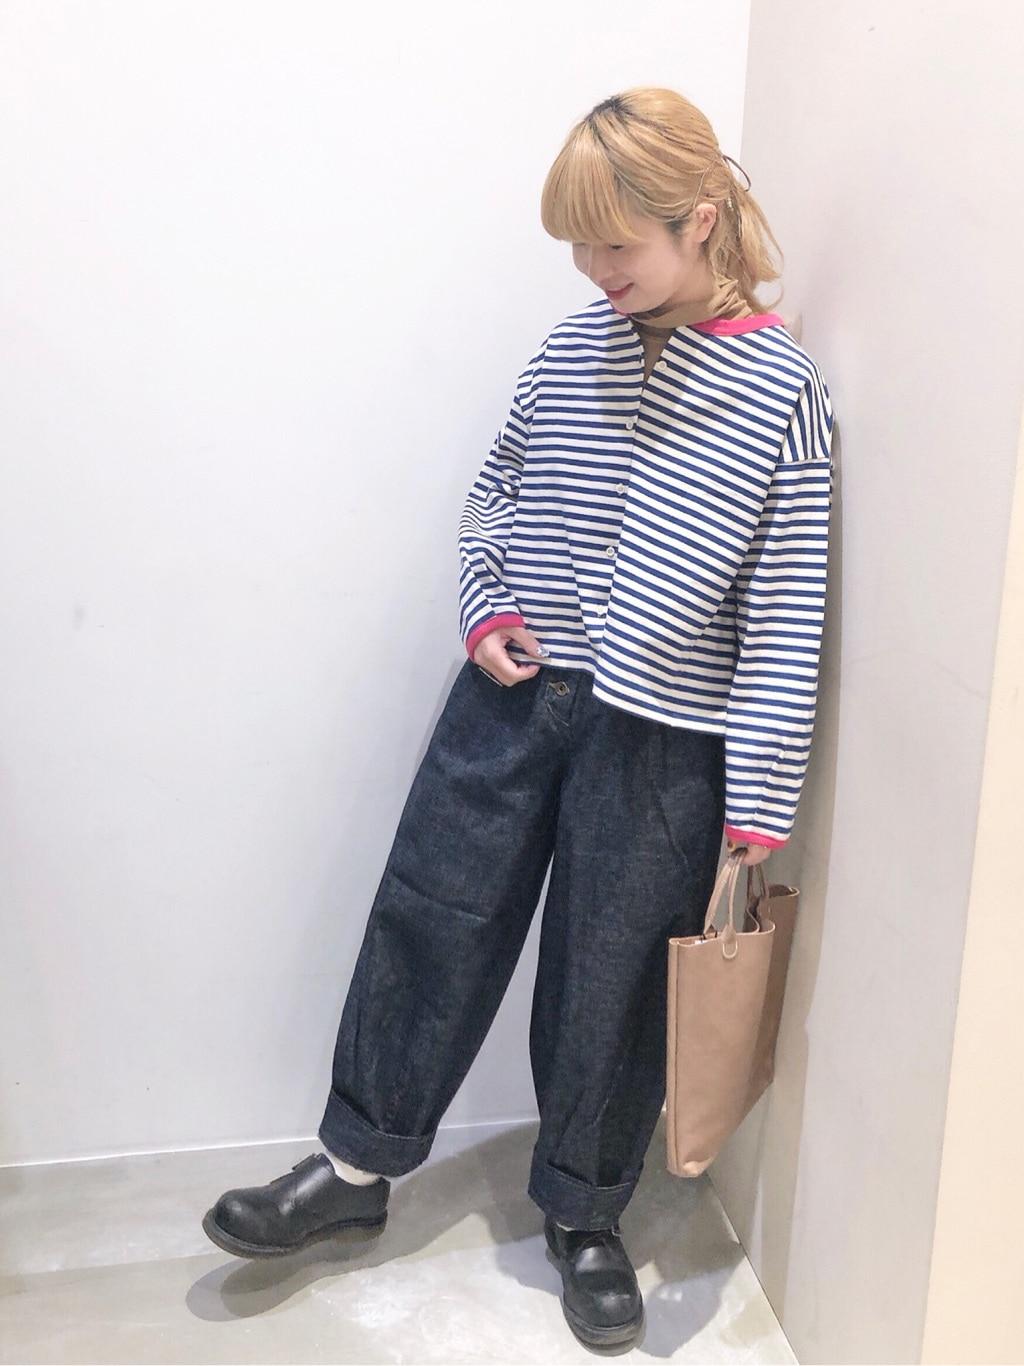 bulle de savon 阪急西宮ガーデンズ 身長:152cm 2020.02.25